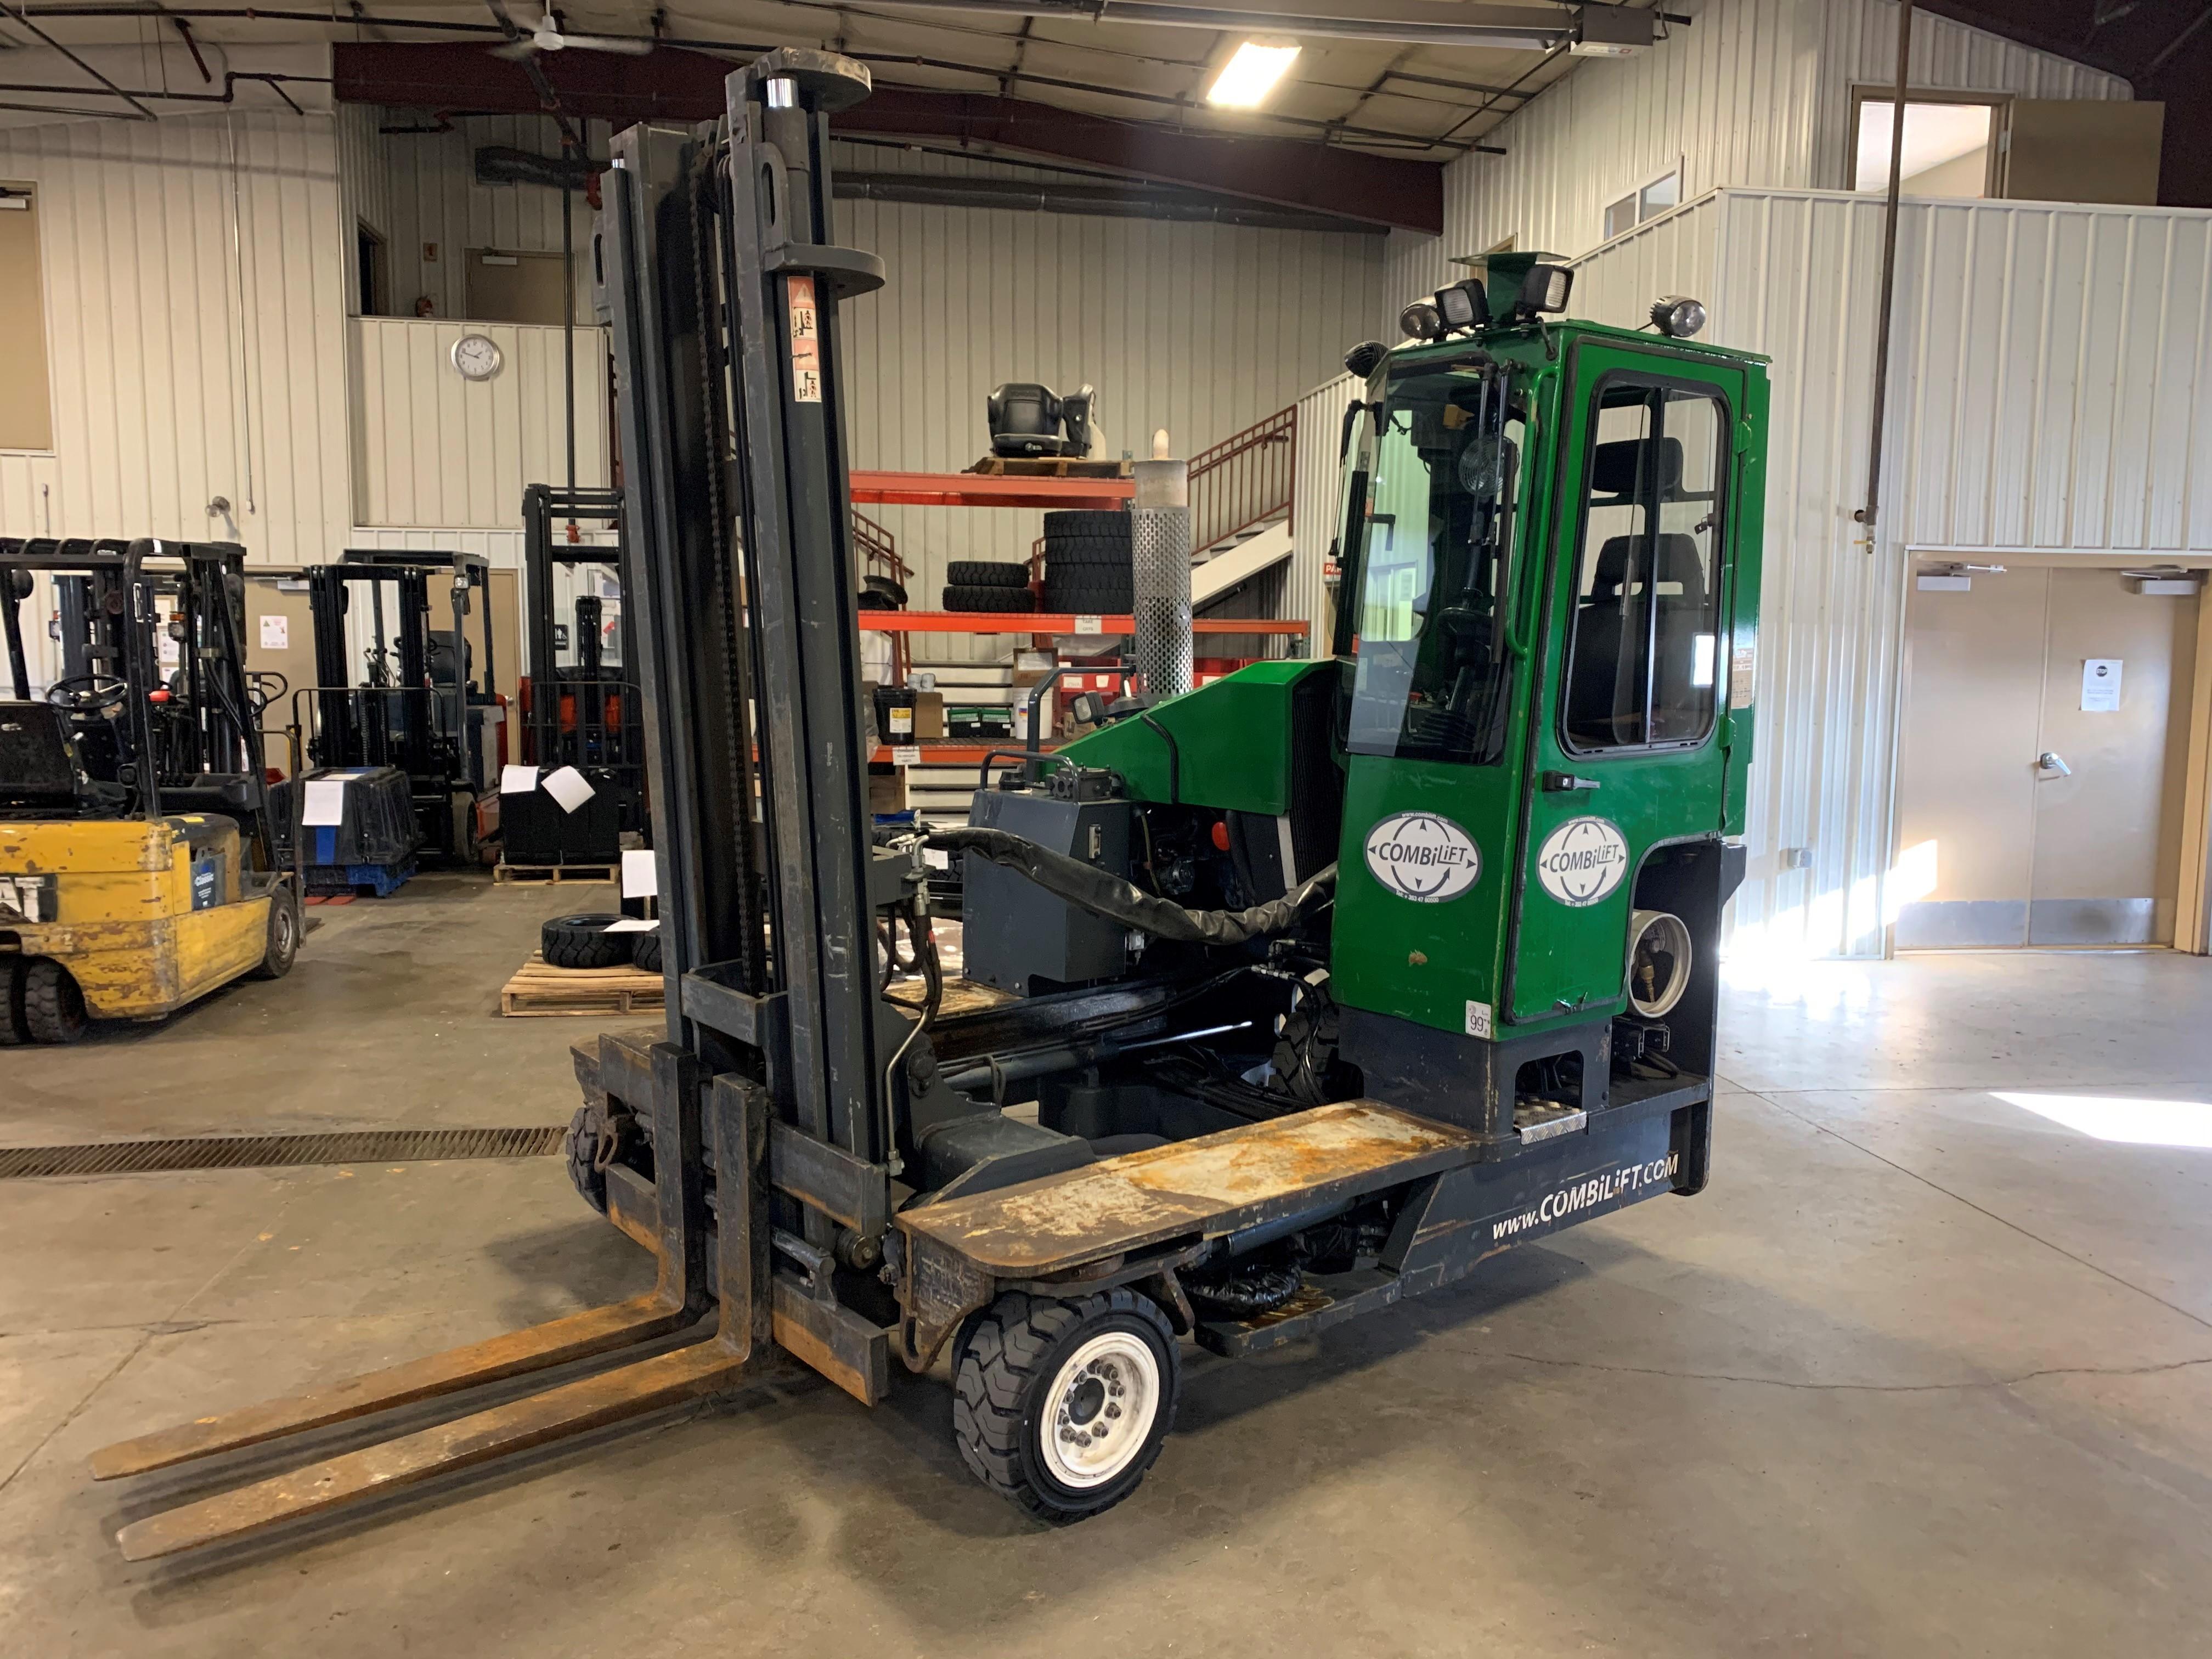 Used, 2013, Combilift, C10,000, Forklifts / Lift Trucks